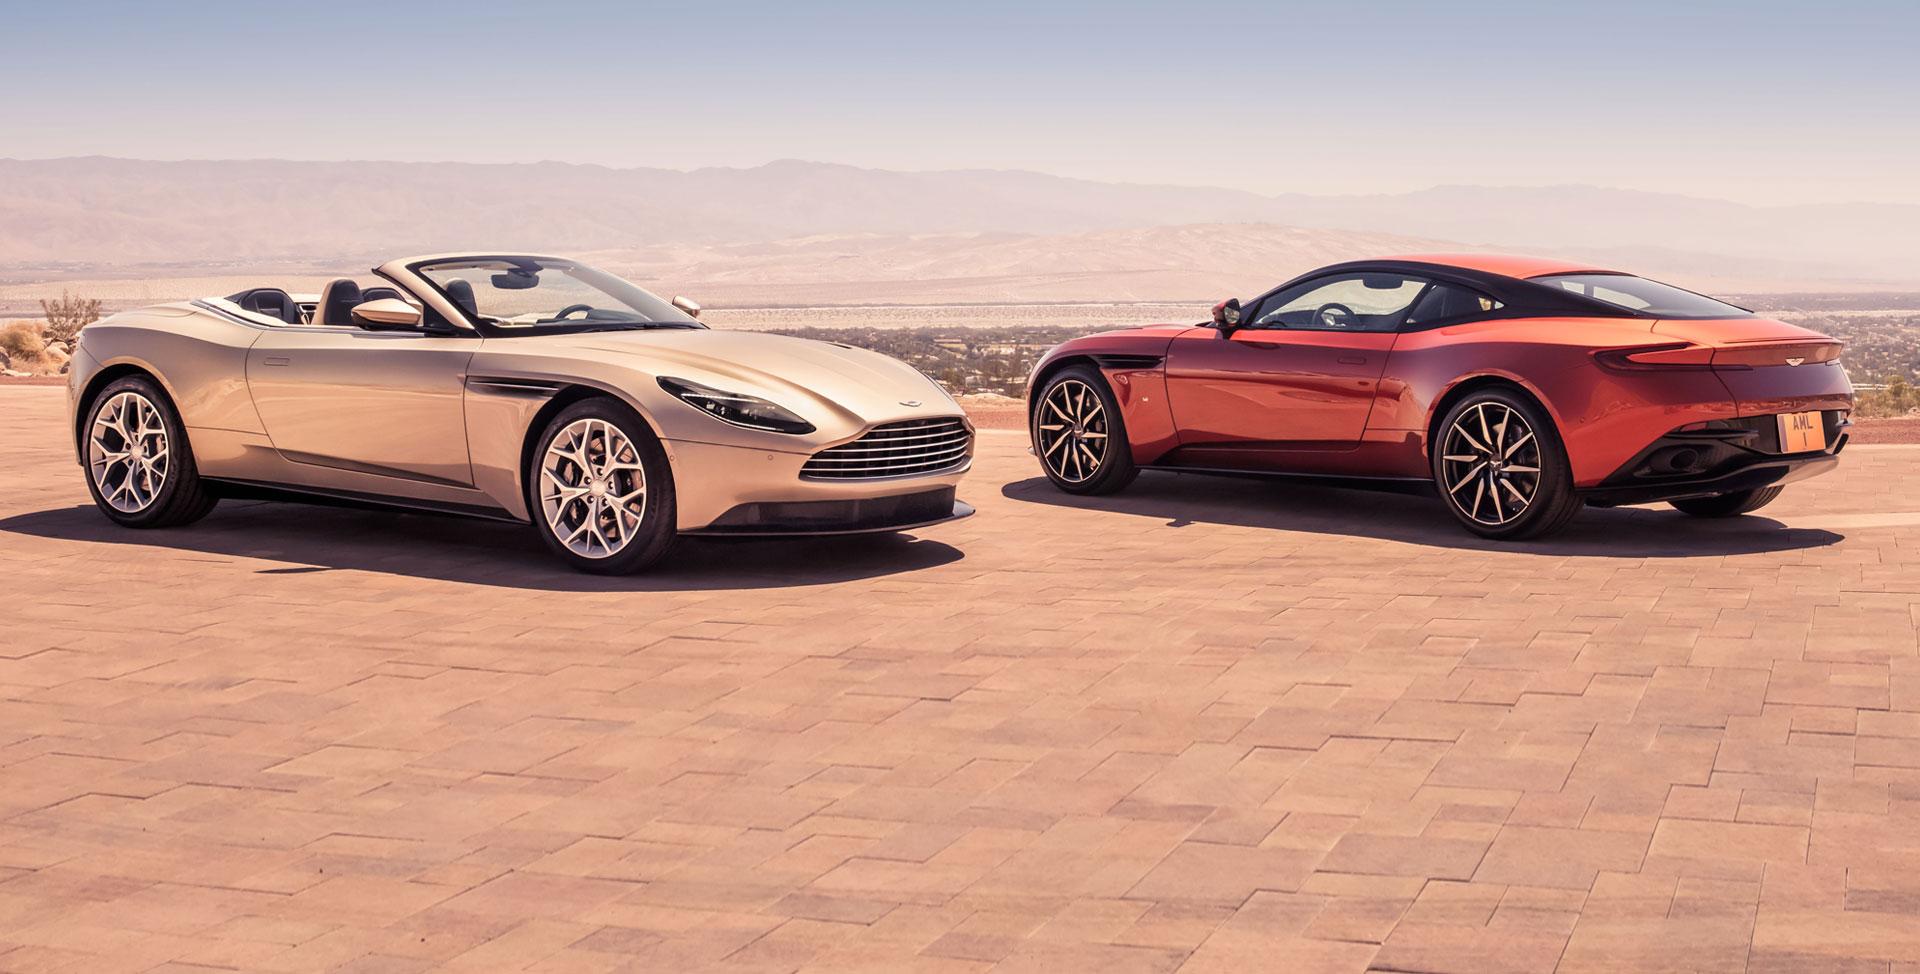 Official Aston Martin Dealership in Miami | The Collection | aston martin dealership florida